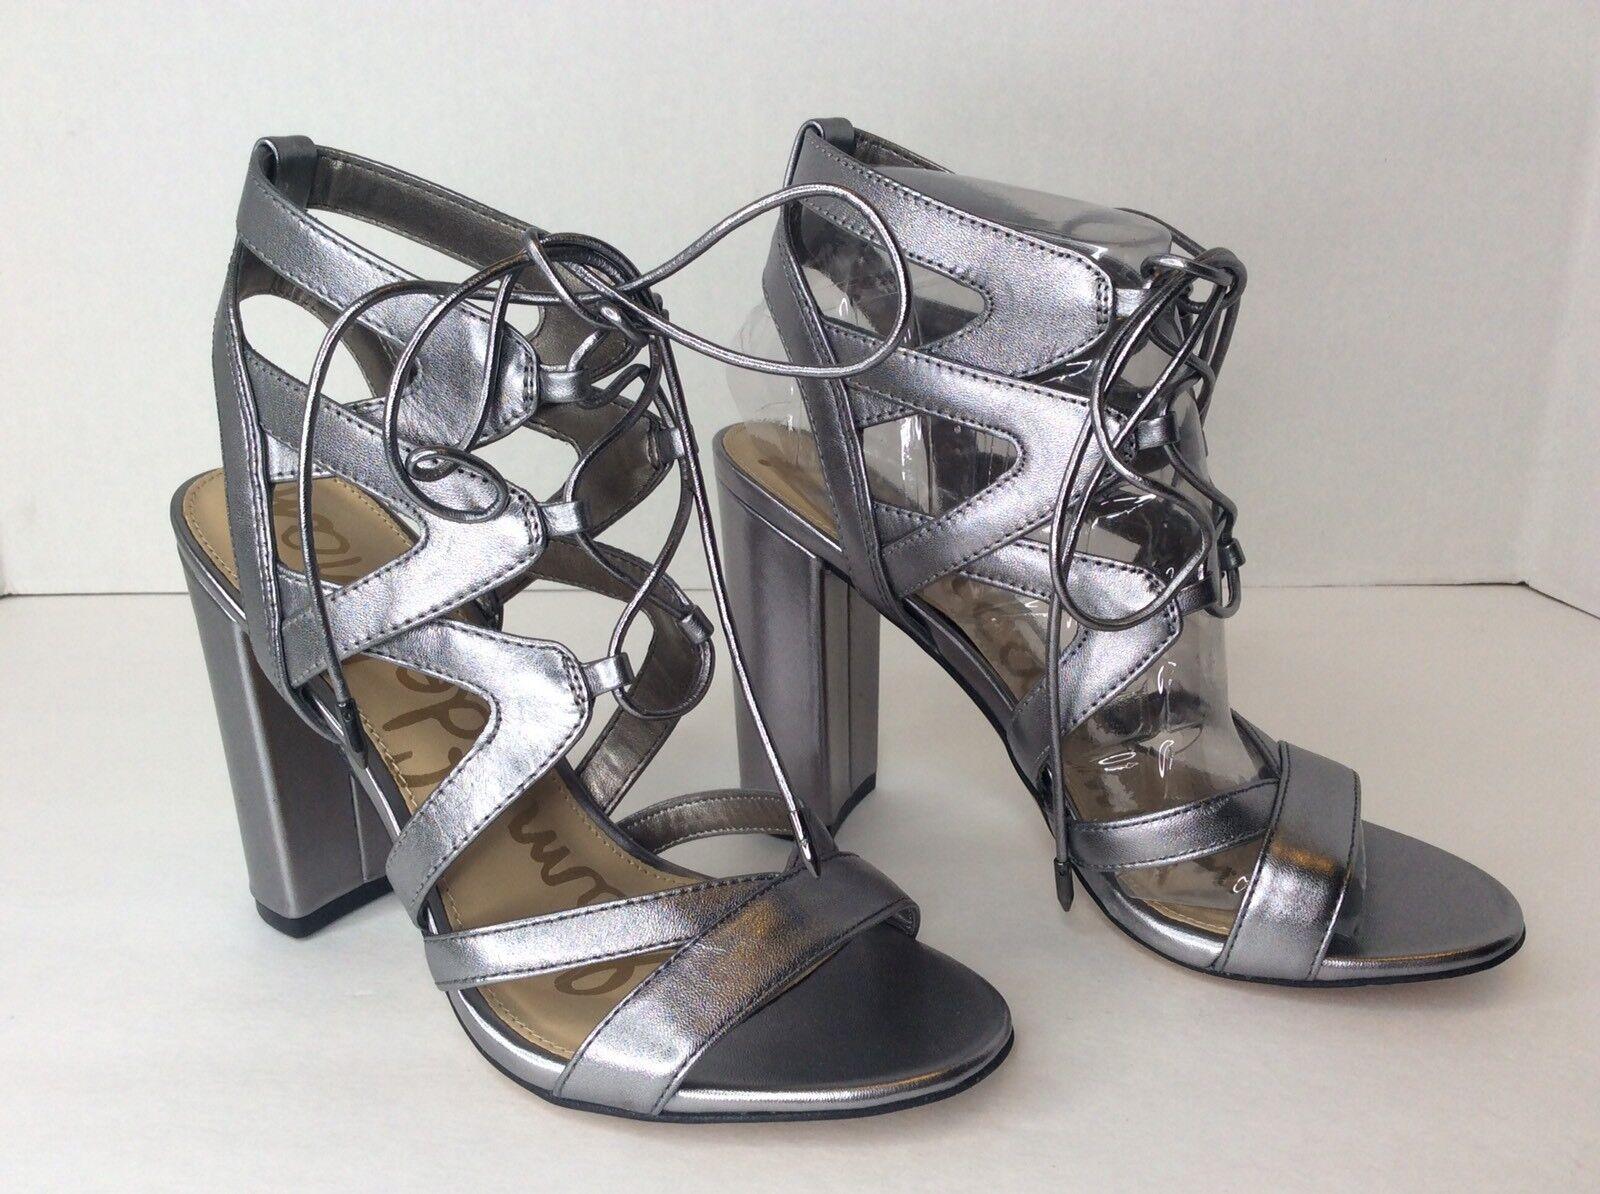 Sam Edelman Yardley Sz 6 Metallic Silver Leder Strappy Sandales Heels Schuhes